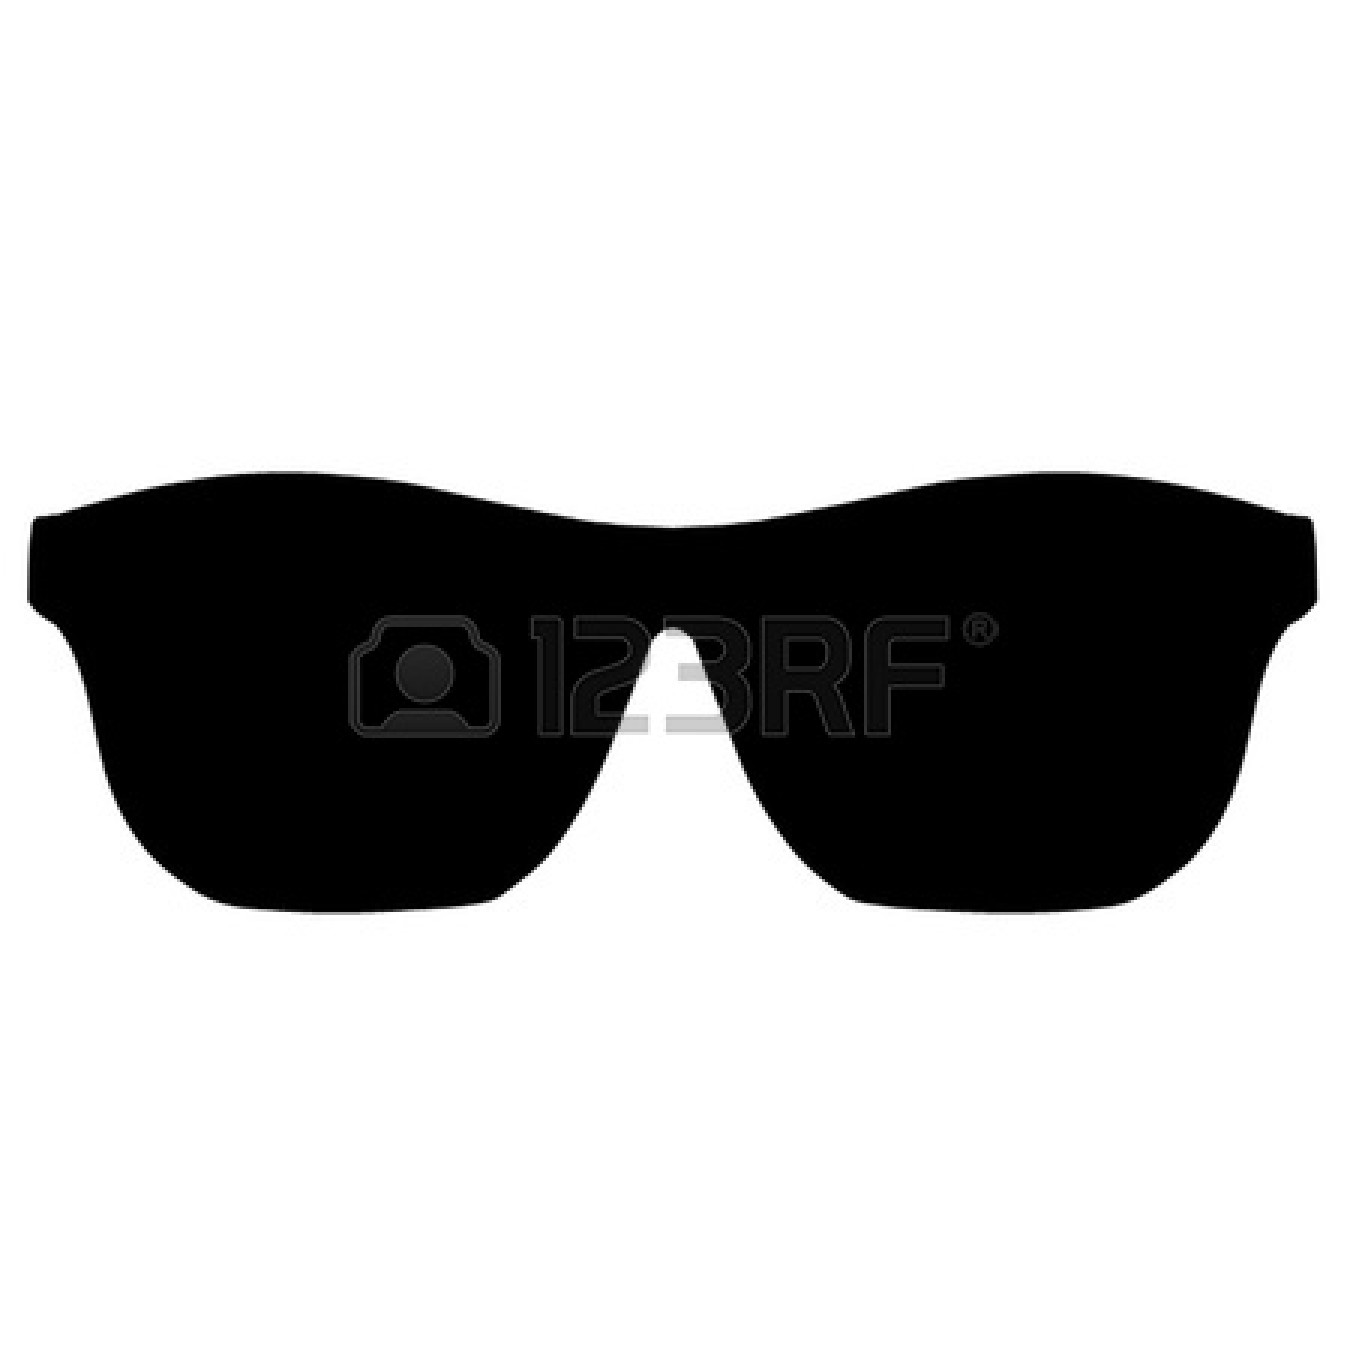 Sunglasses and sunscreen clipart jpg free sunscreen : Sunglasses Shades | Clipart Panda - Free Clipart ... jpg free